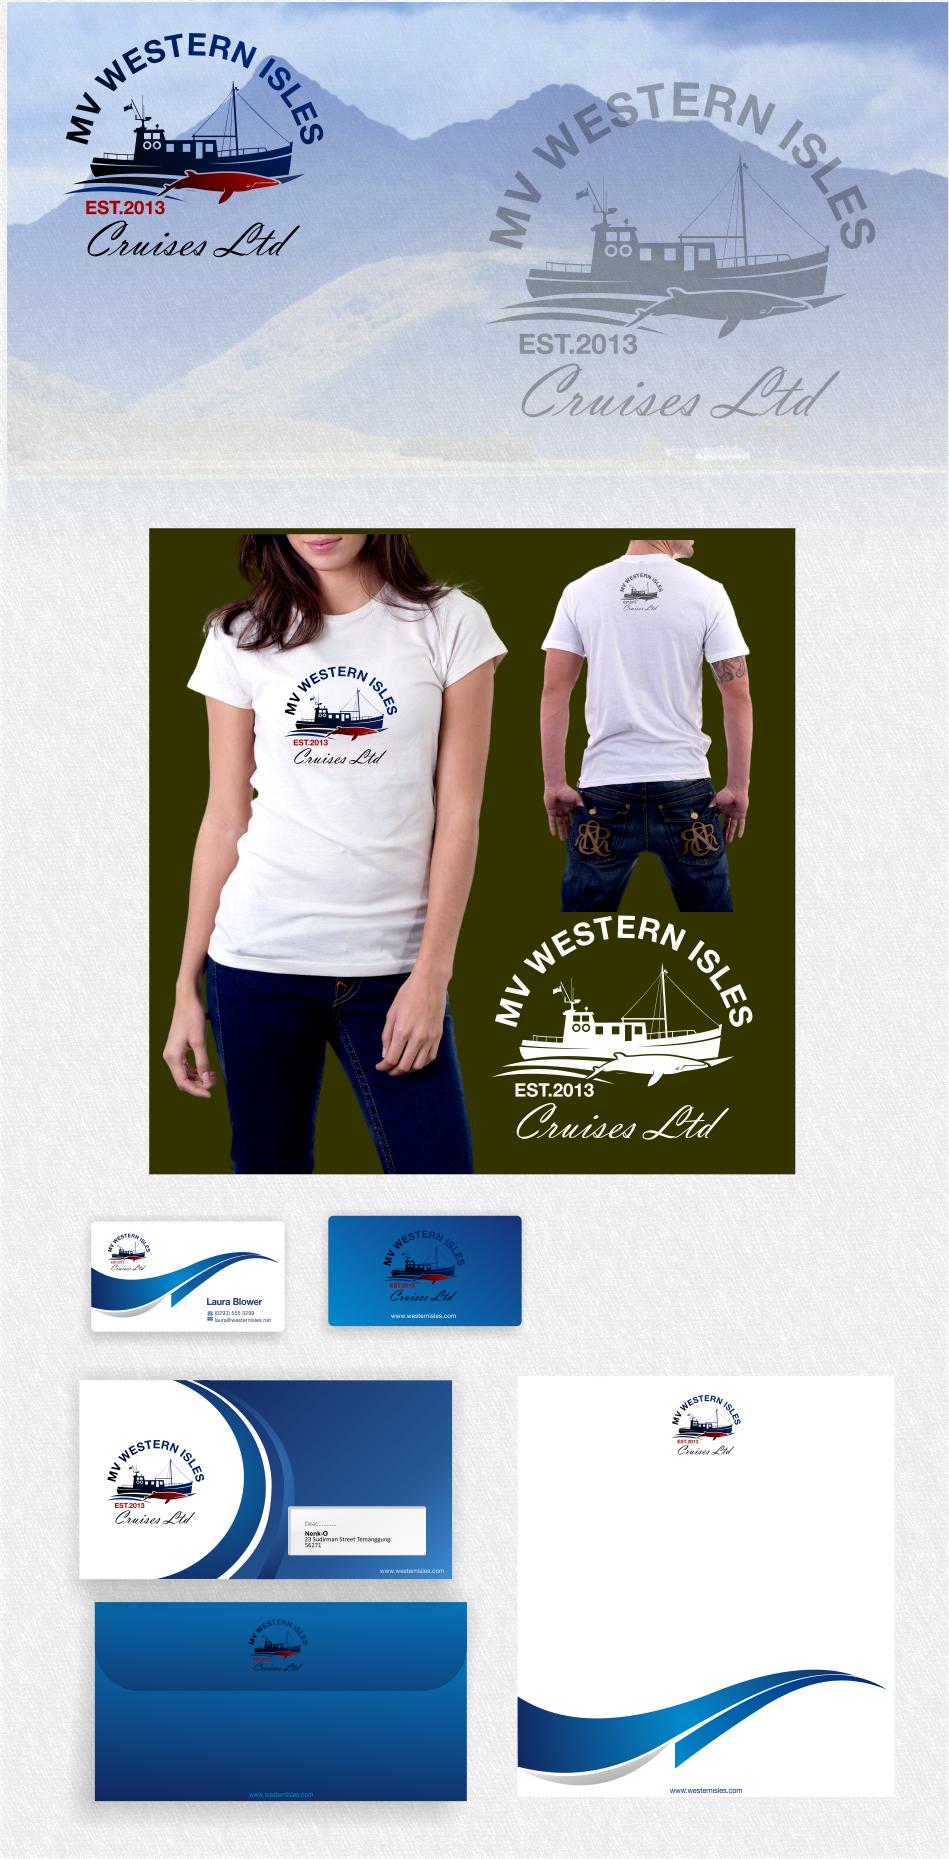 MV Western Isles Cruises LTD needs a new logo